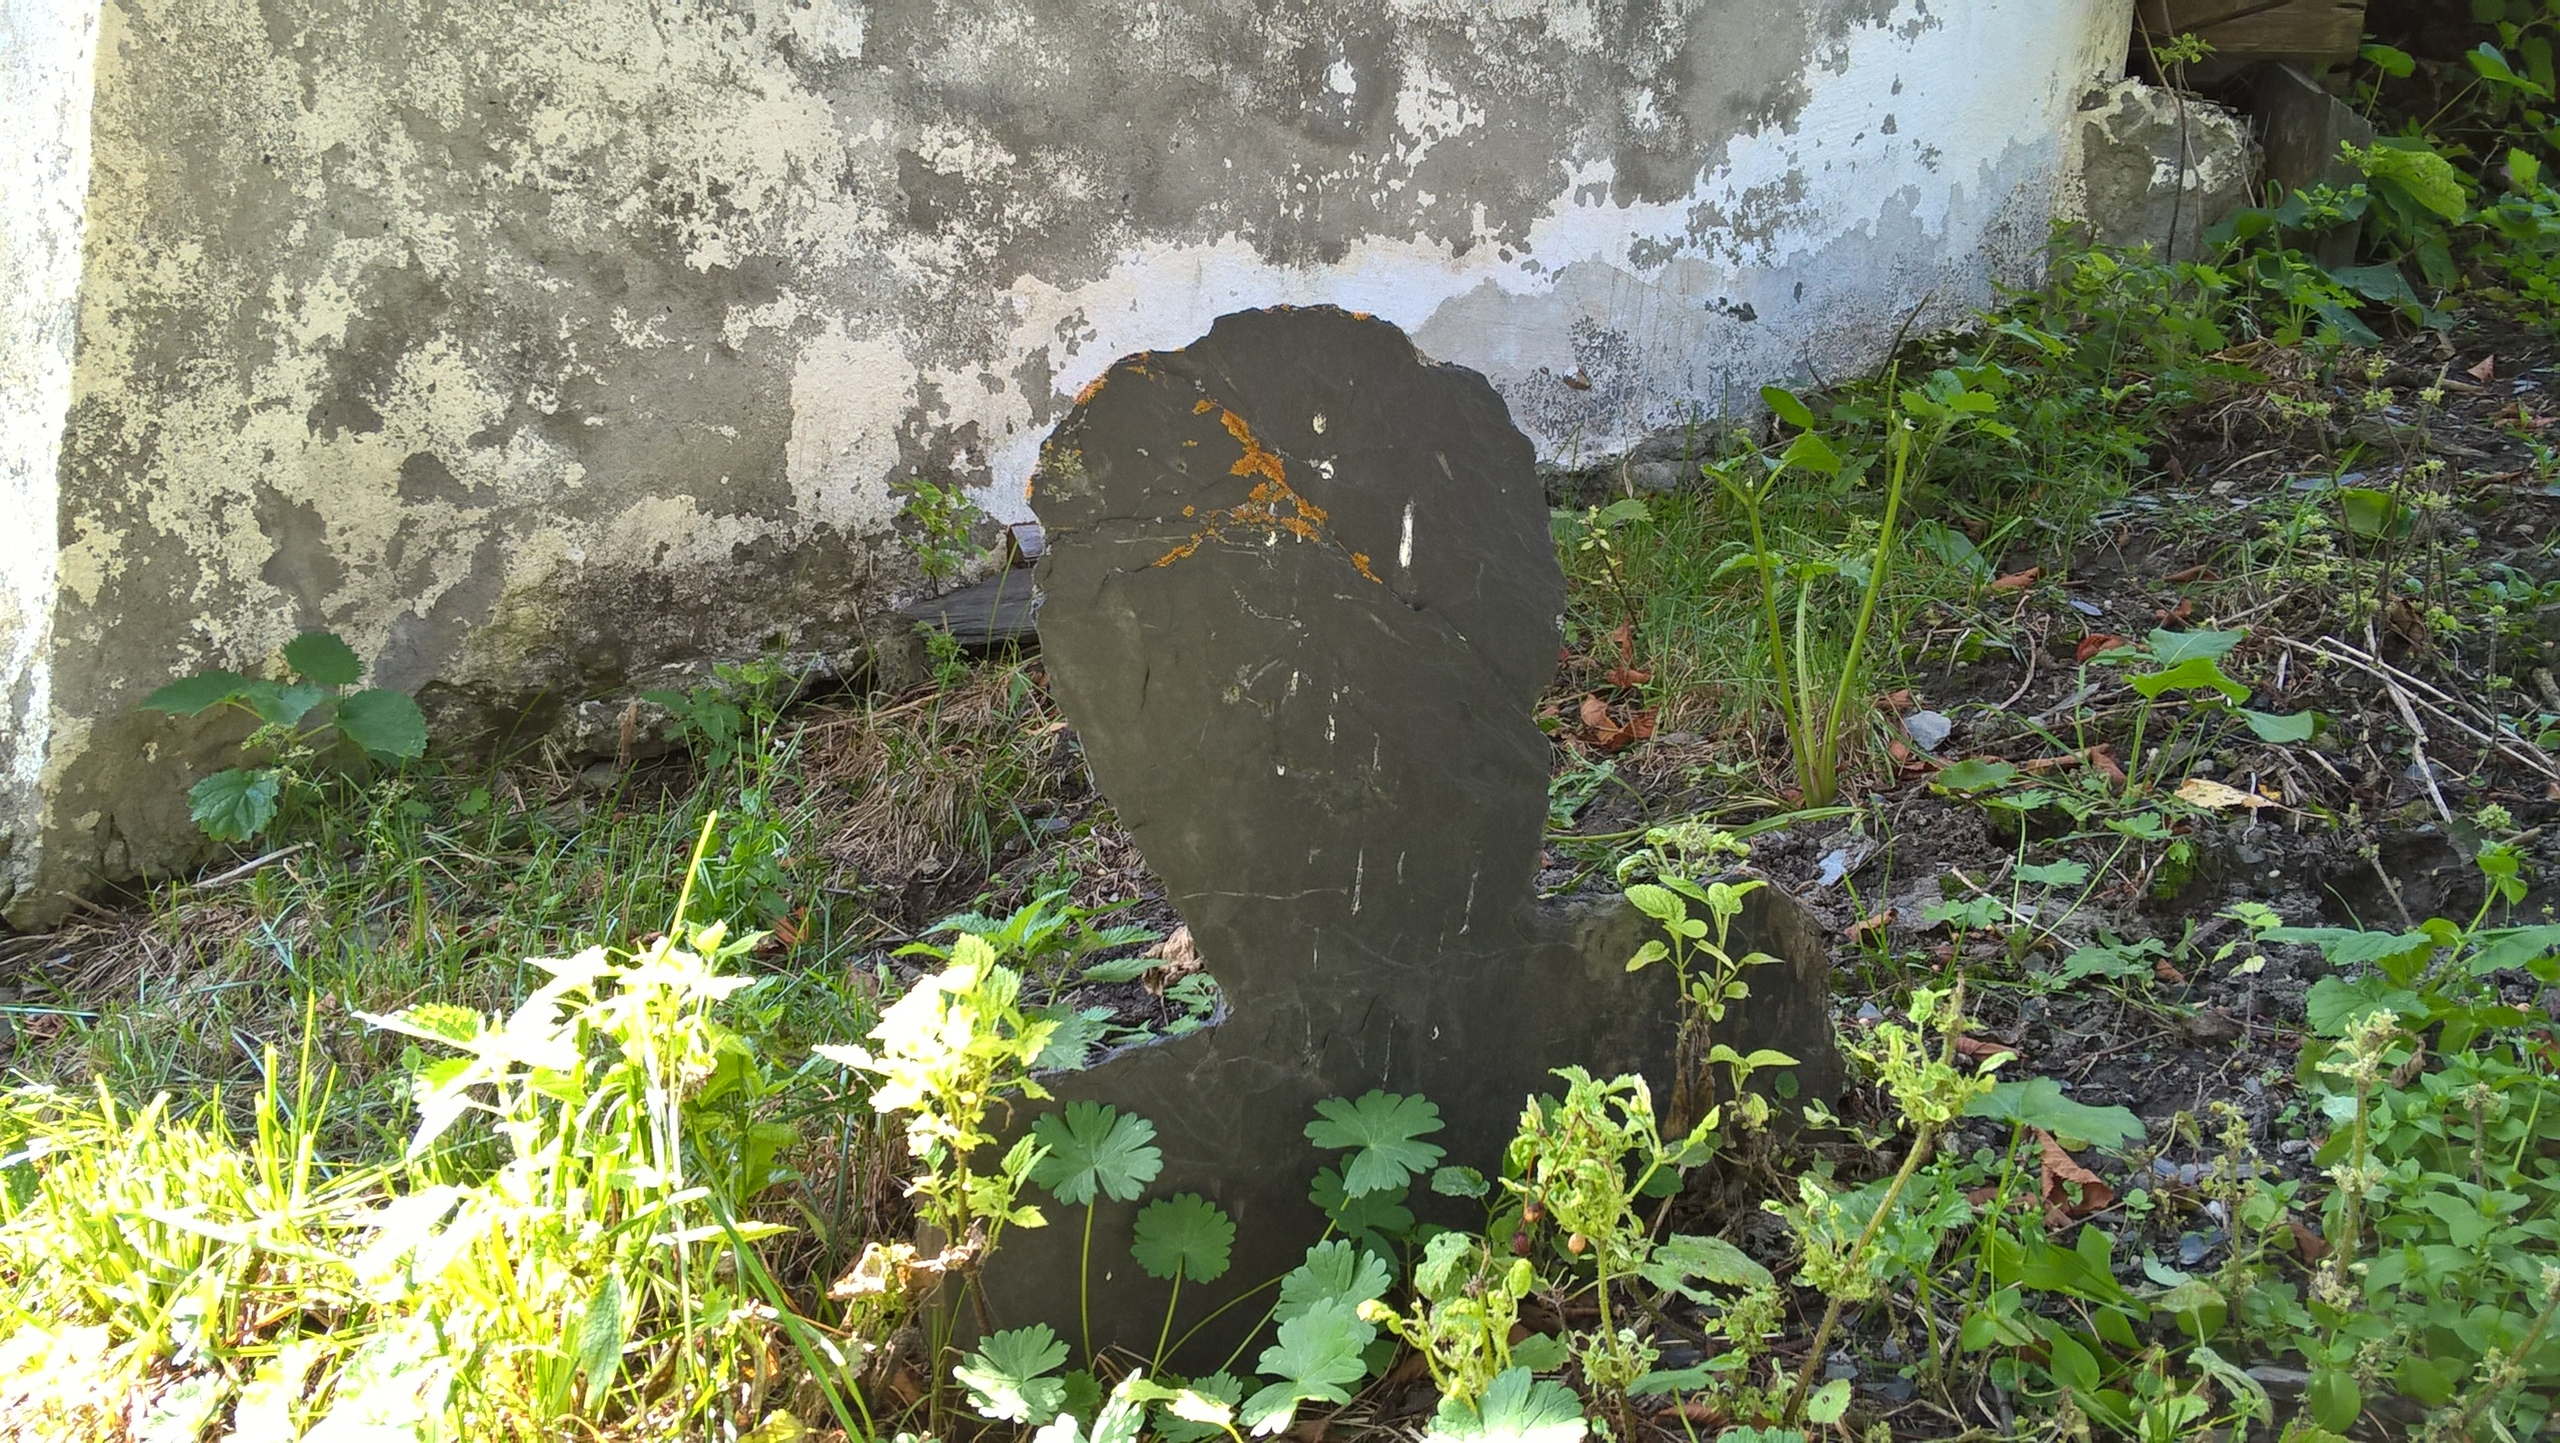 надгробье в виде силуэта человека